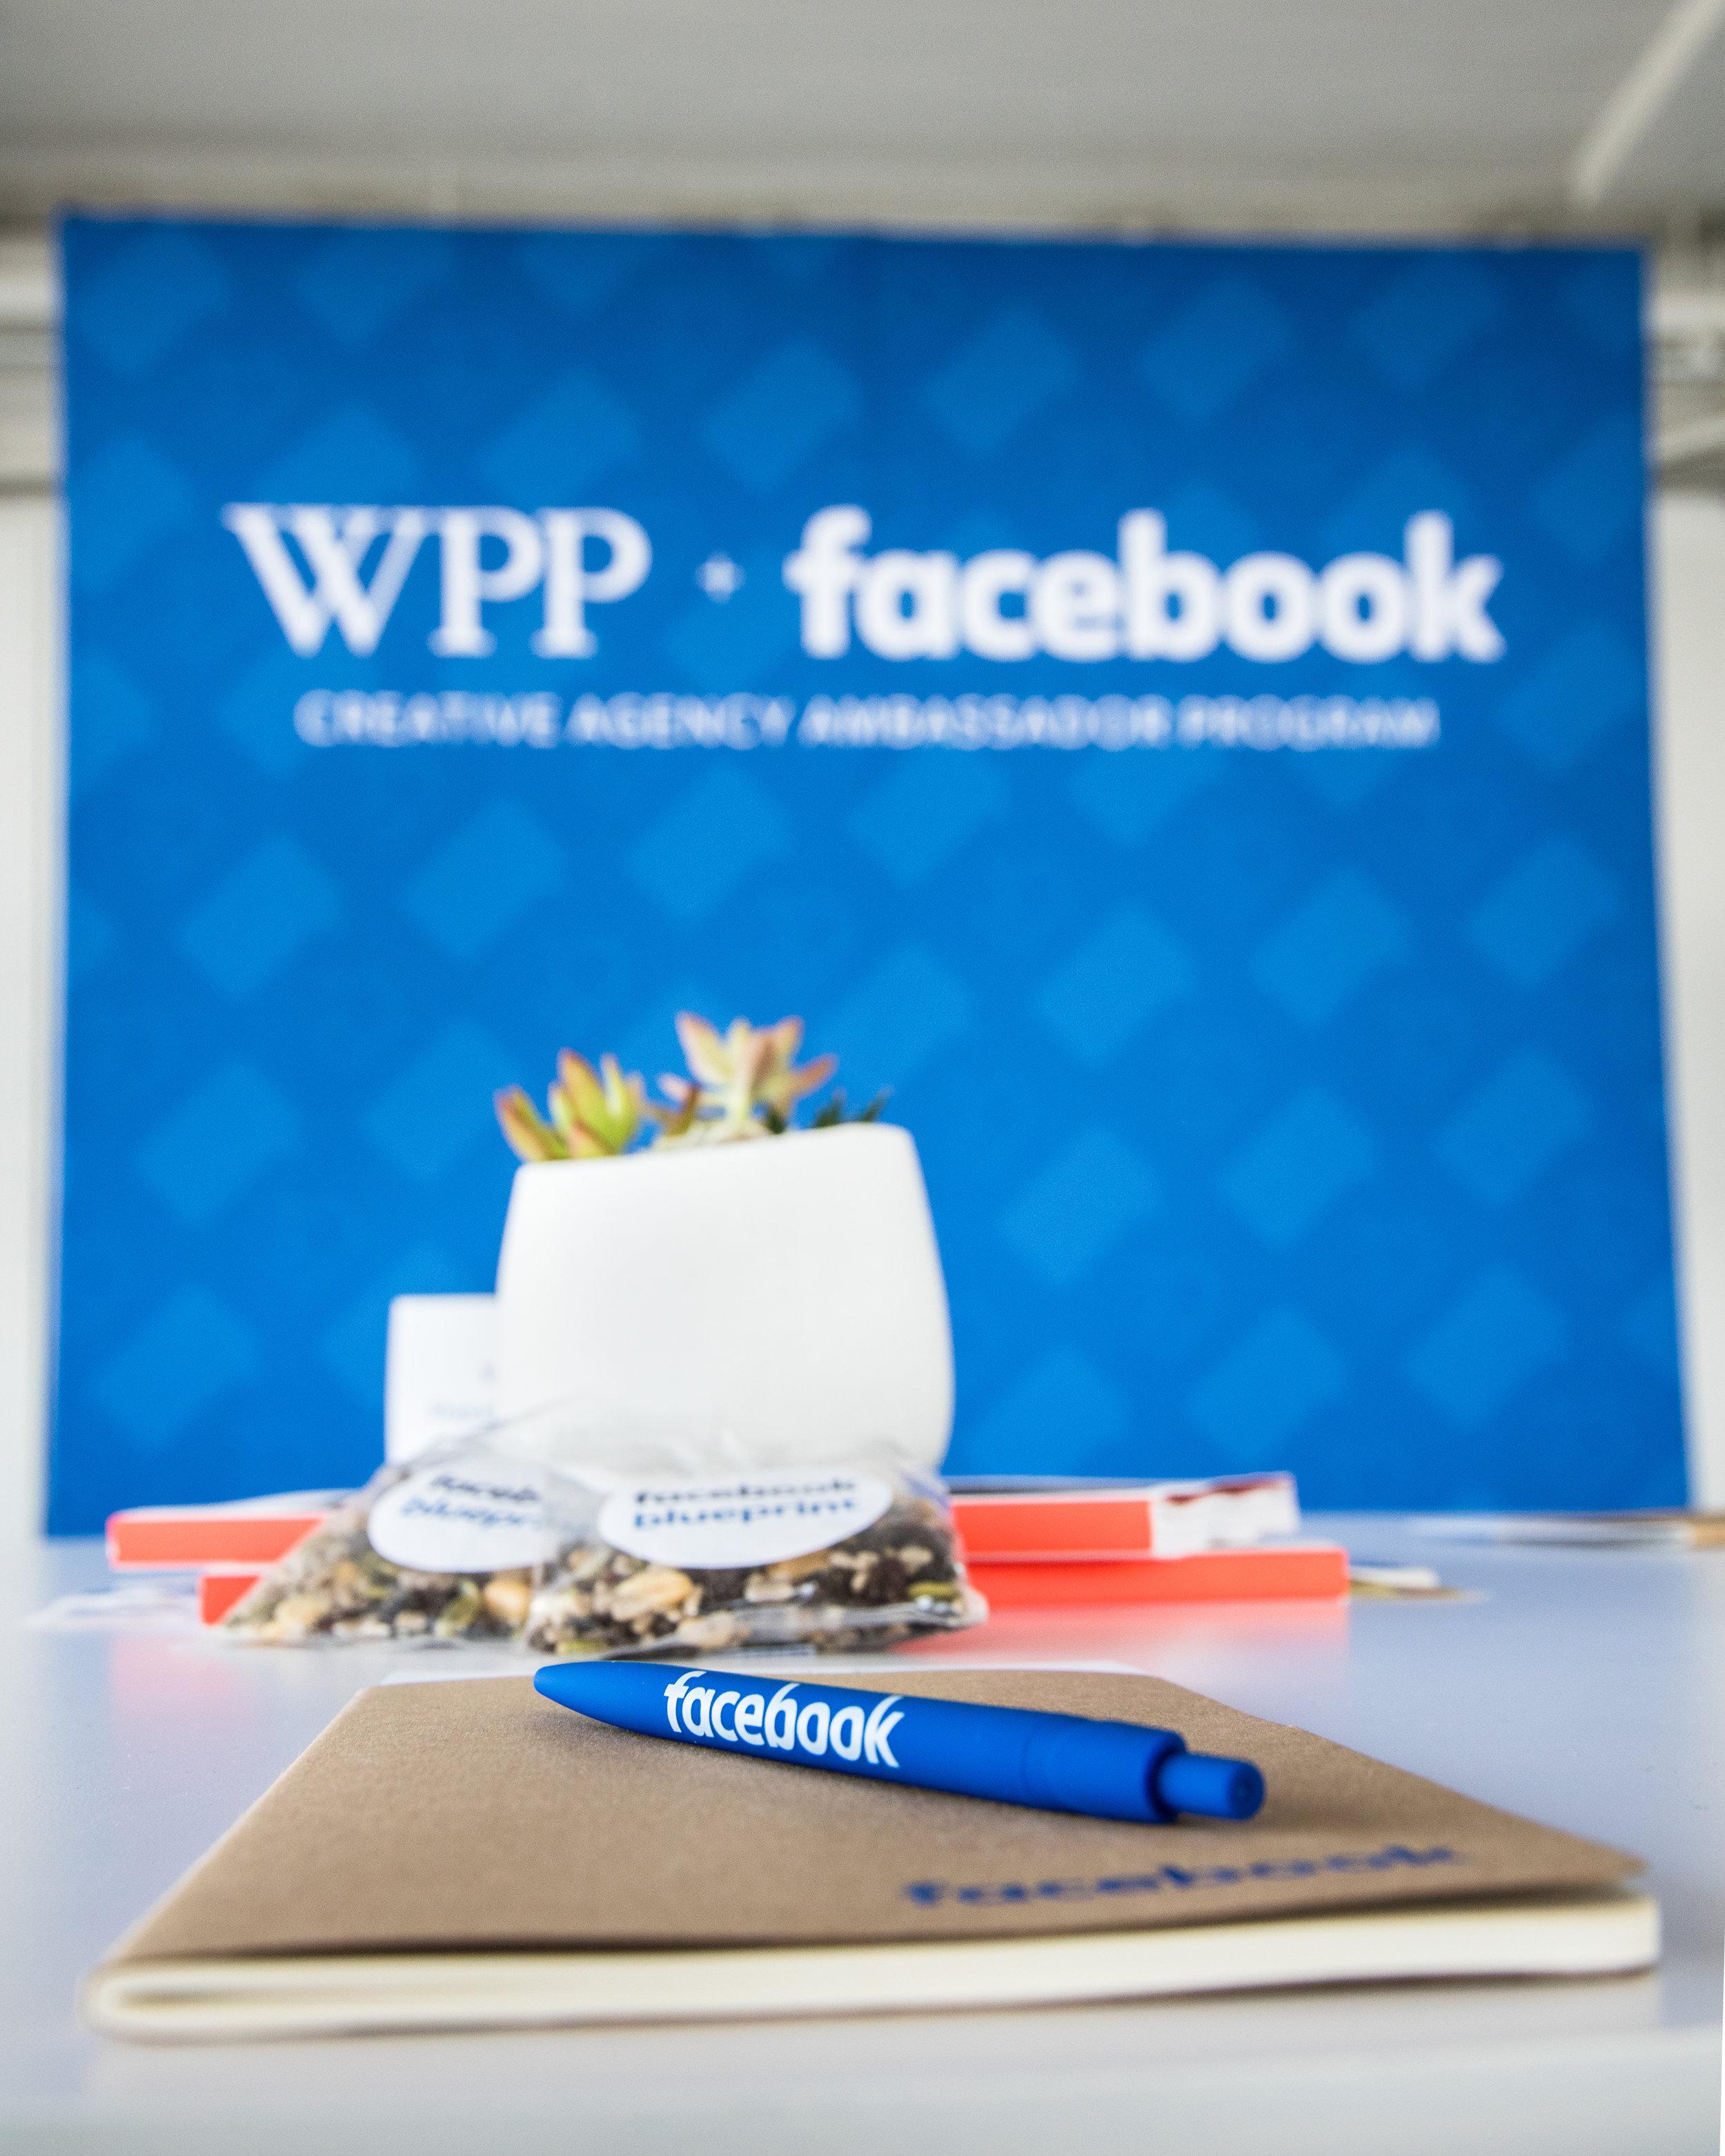 WPP-FB-1.jpg